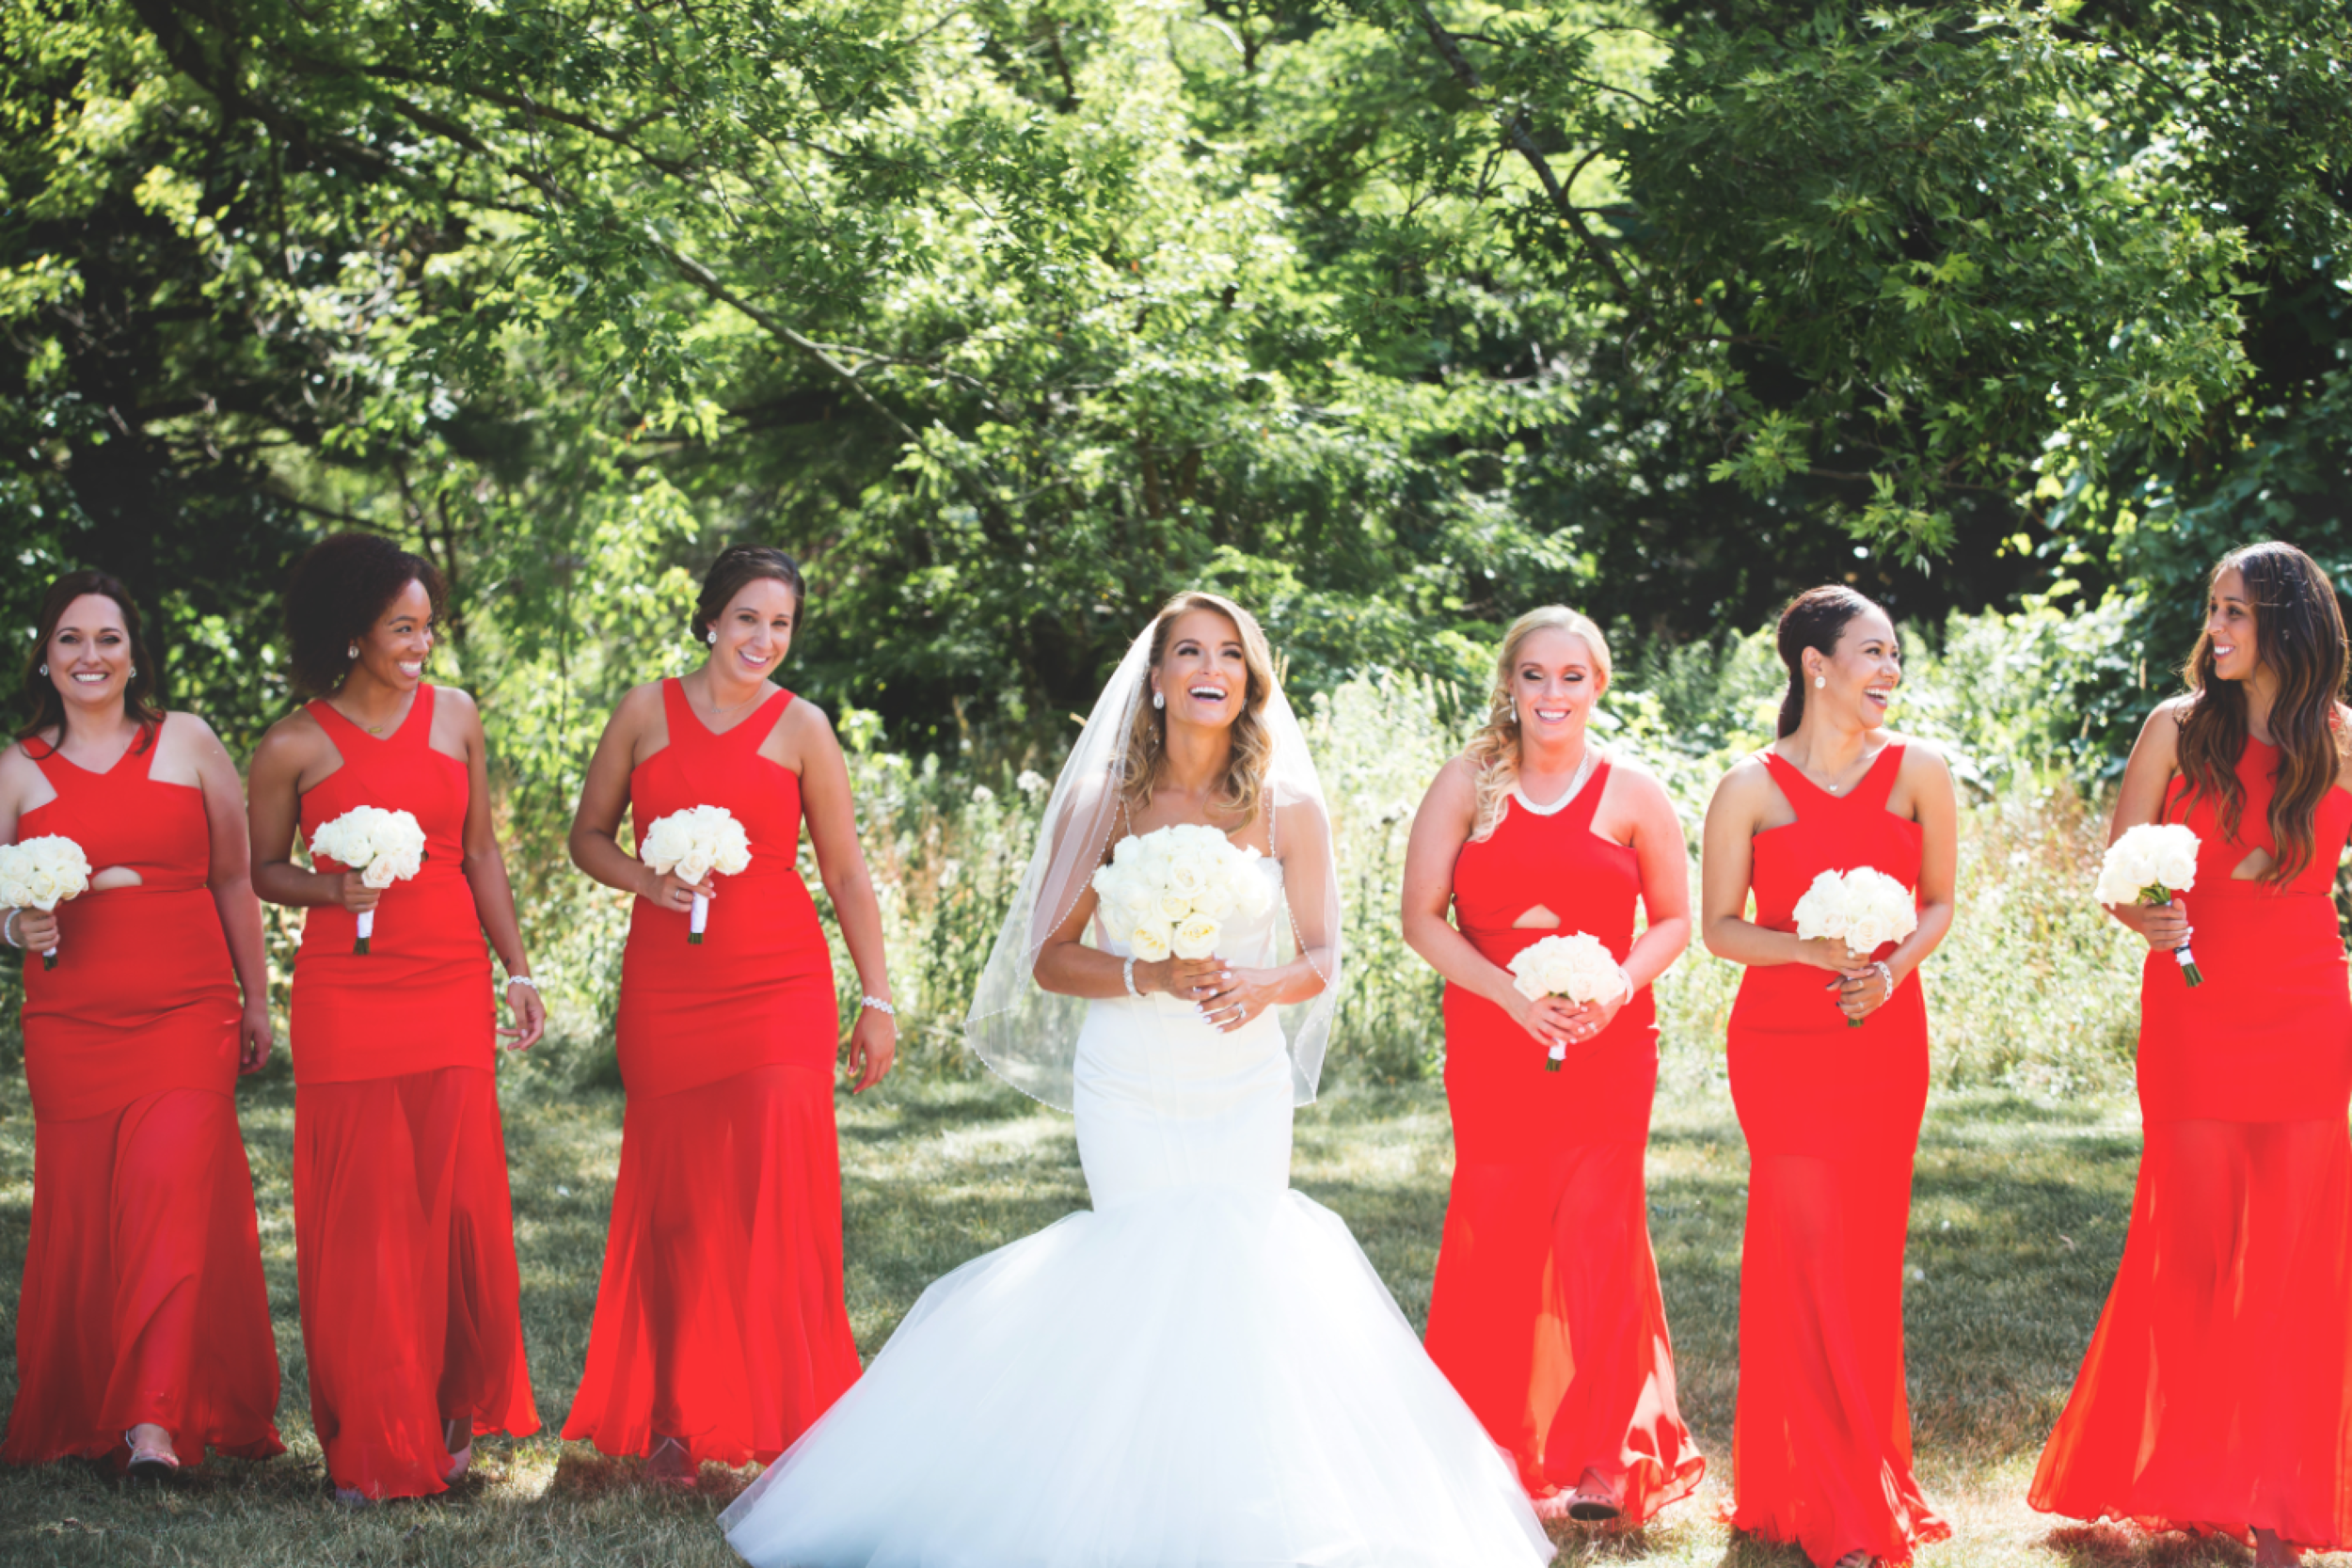 Wedding-Burlington-Convention-Center-Burlington-Oakville-Toronto-Hamilton-Niagara-Wedding-Photographer-Photography-Moments-by-Lauren-Photo-Image-29.png